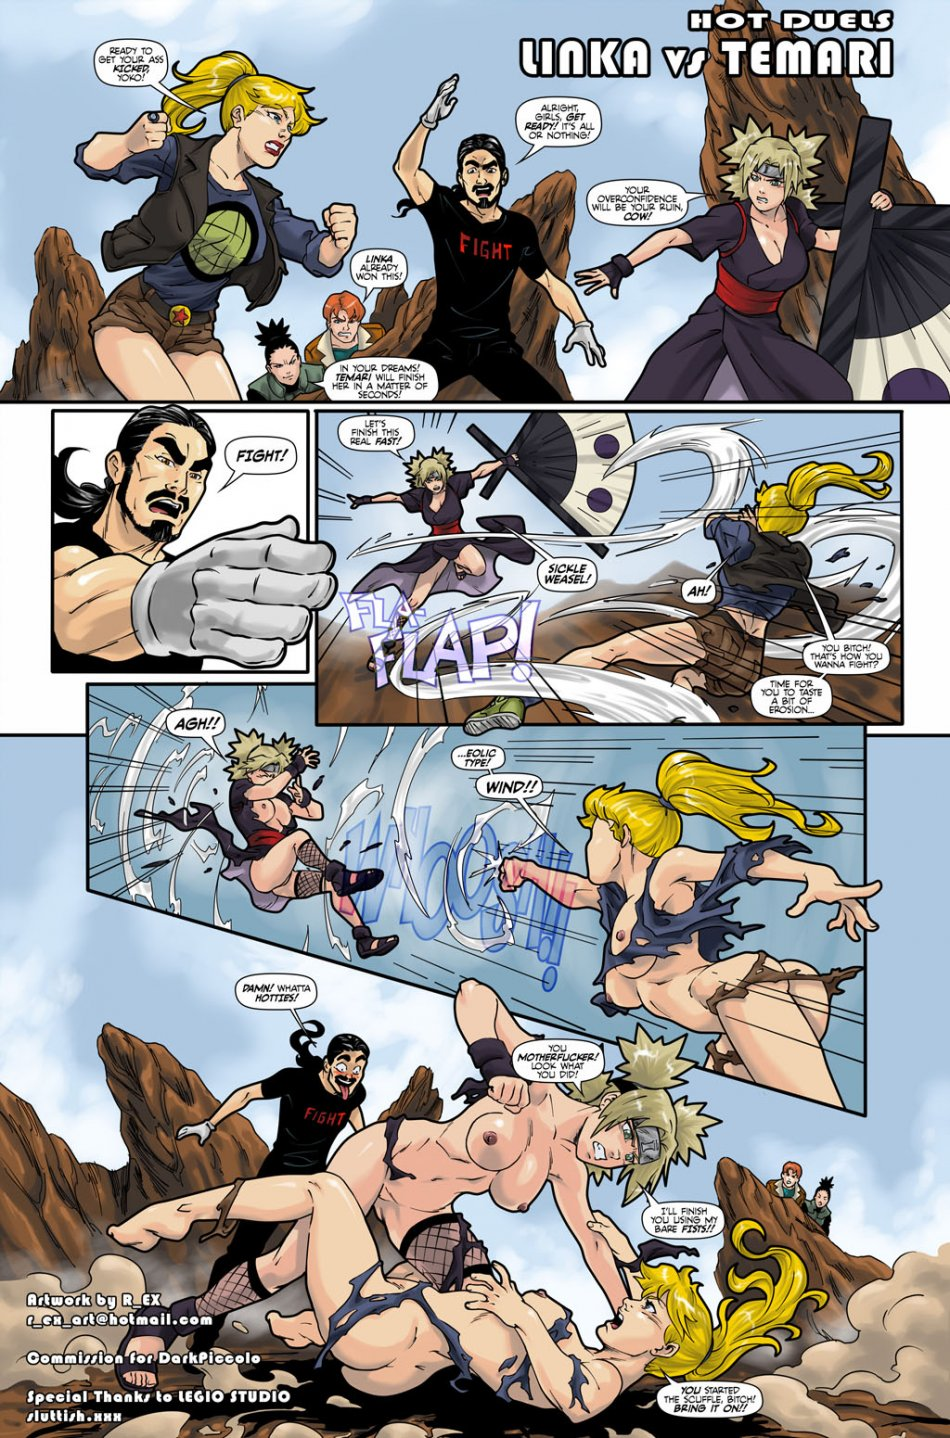 Hot Duels:Temari vs Linka